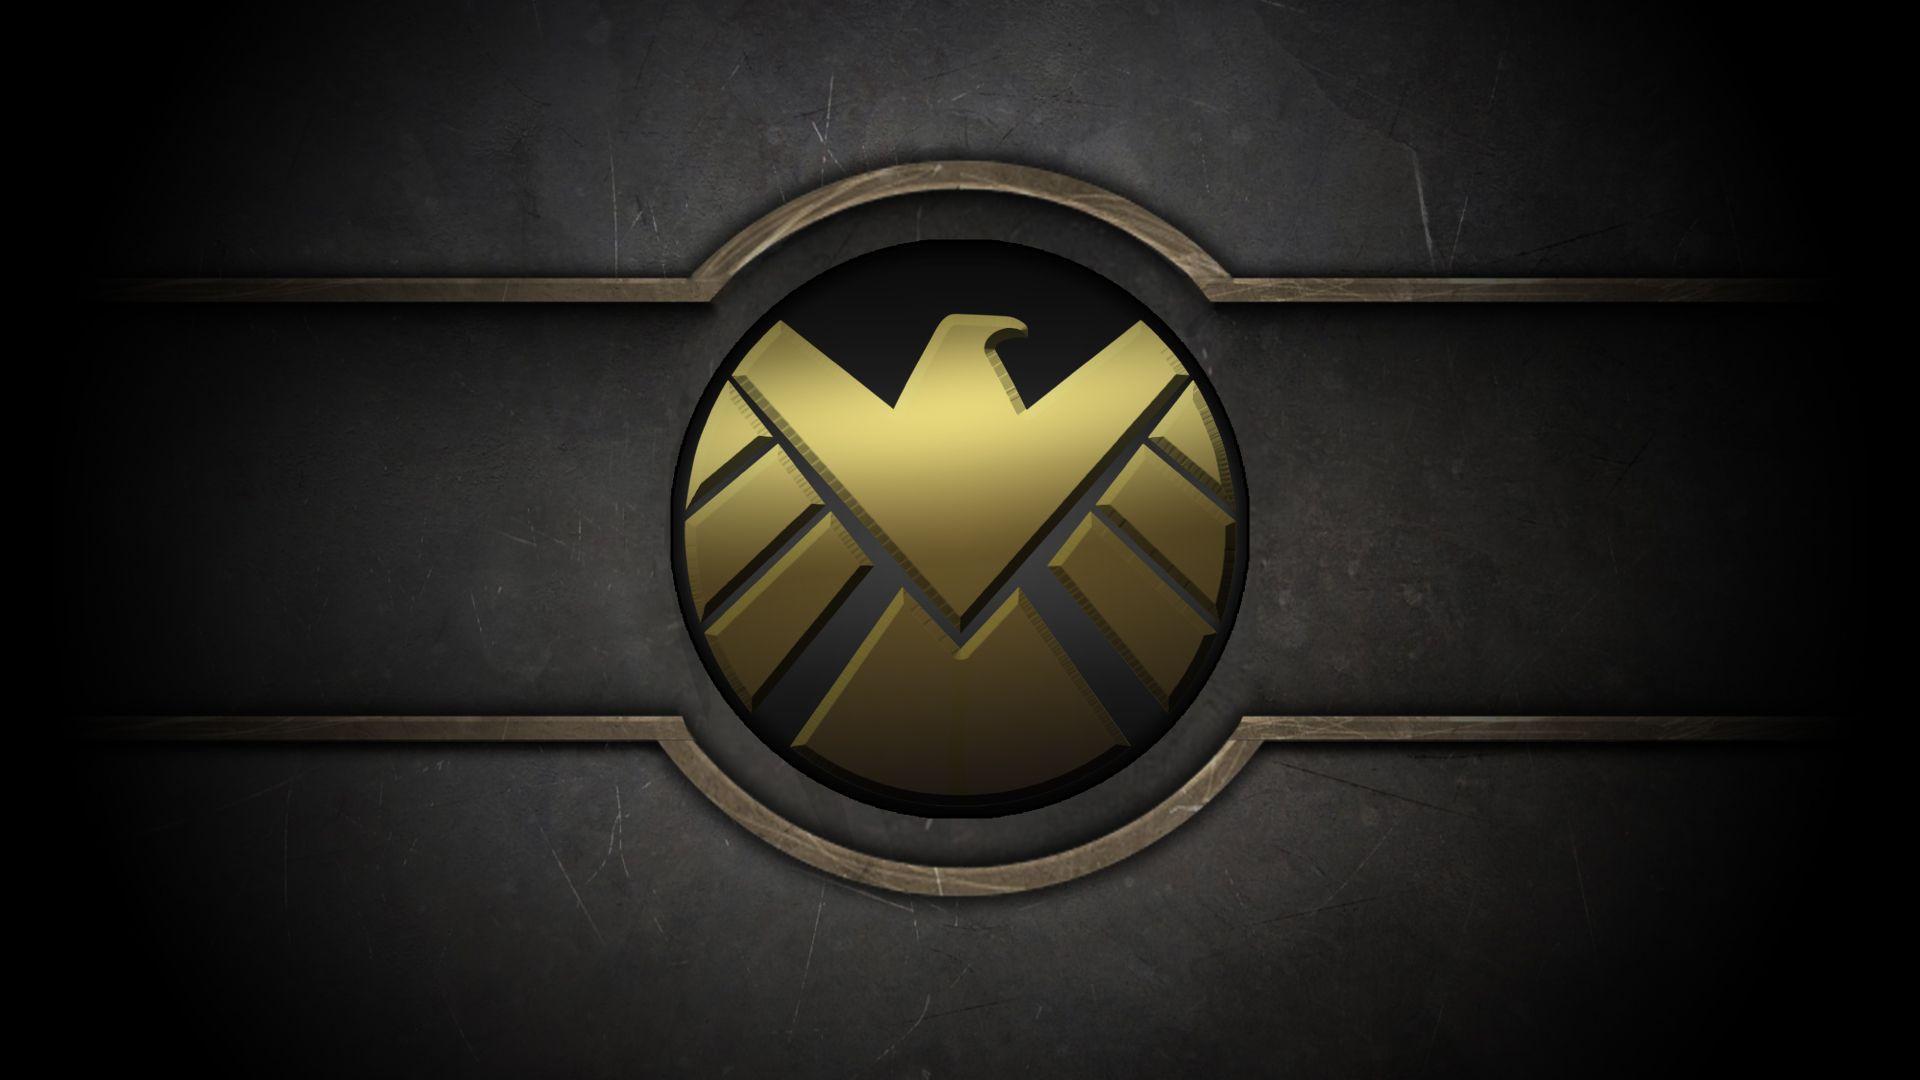 Marvel S H I E L D Logo Wallpapers Top Free Marvel S H I E L D